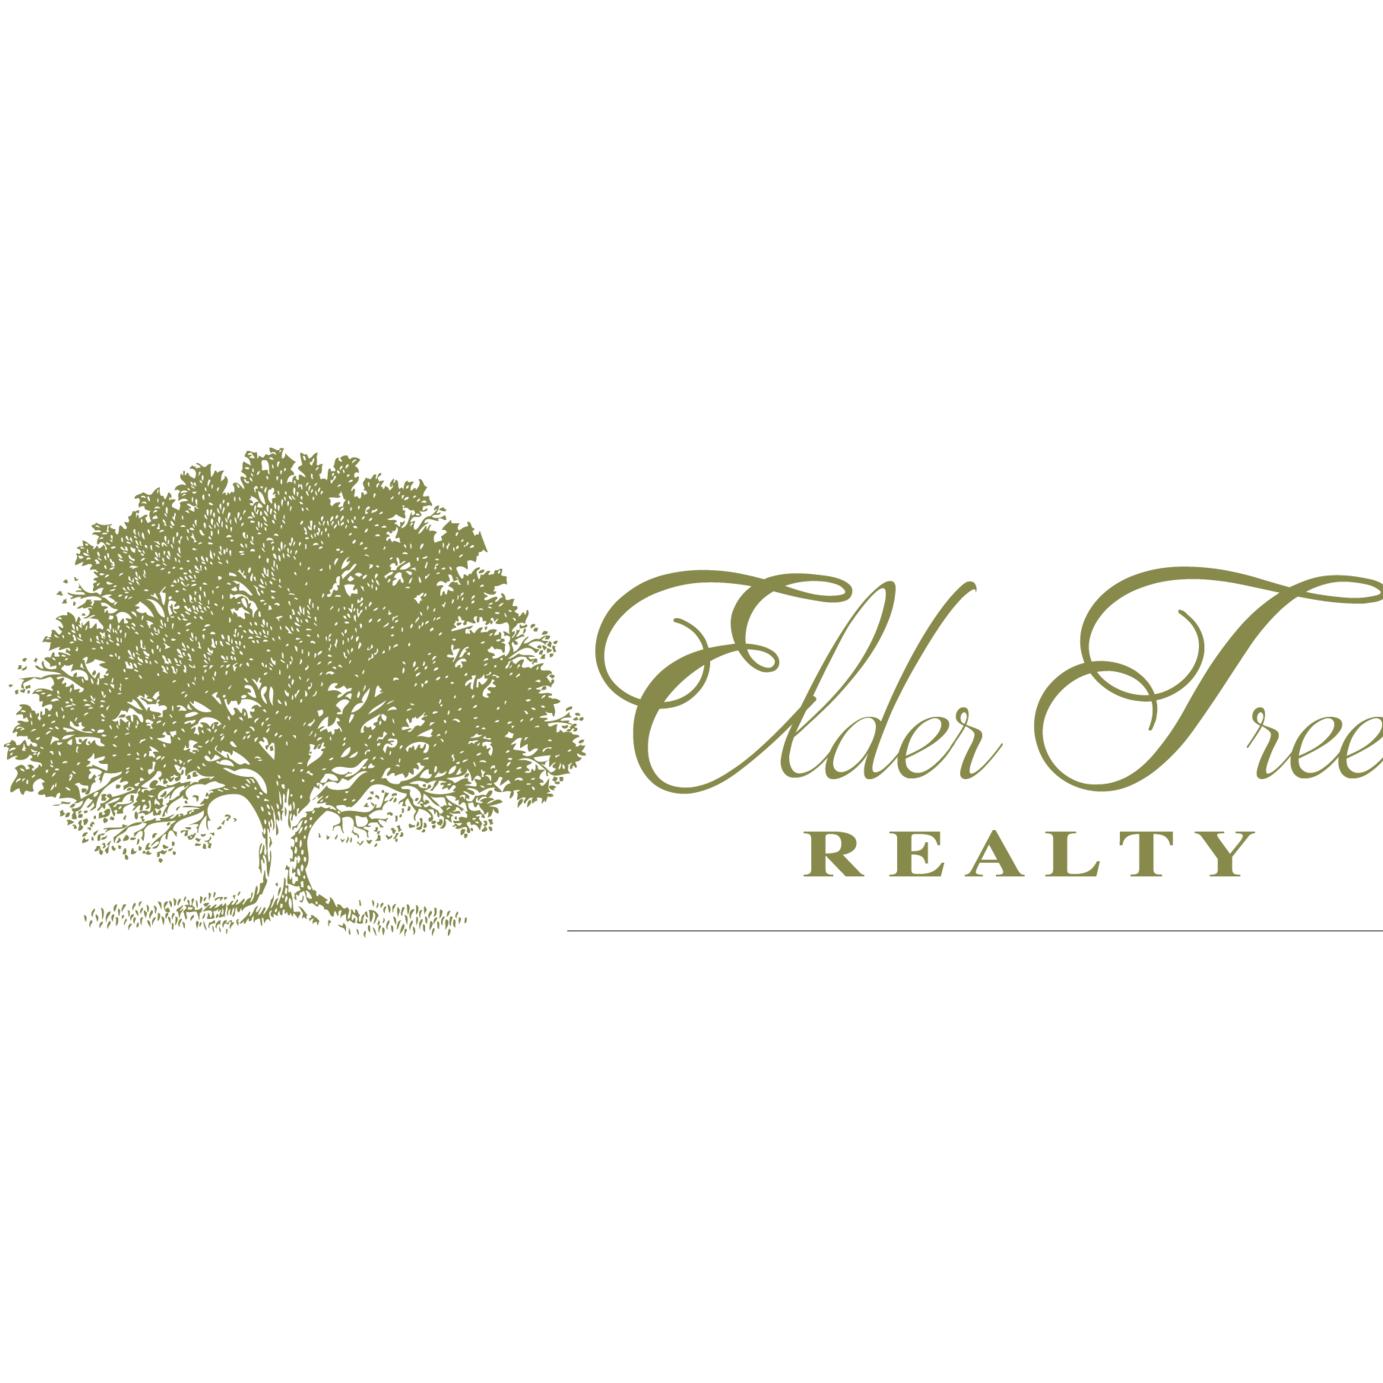 Elder Tree Realty - Bedford, TX - Real Estate Agents